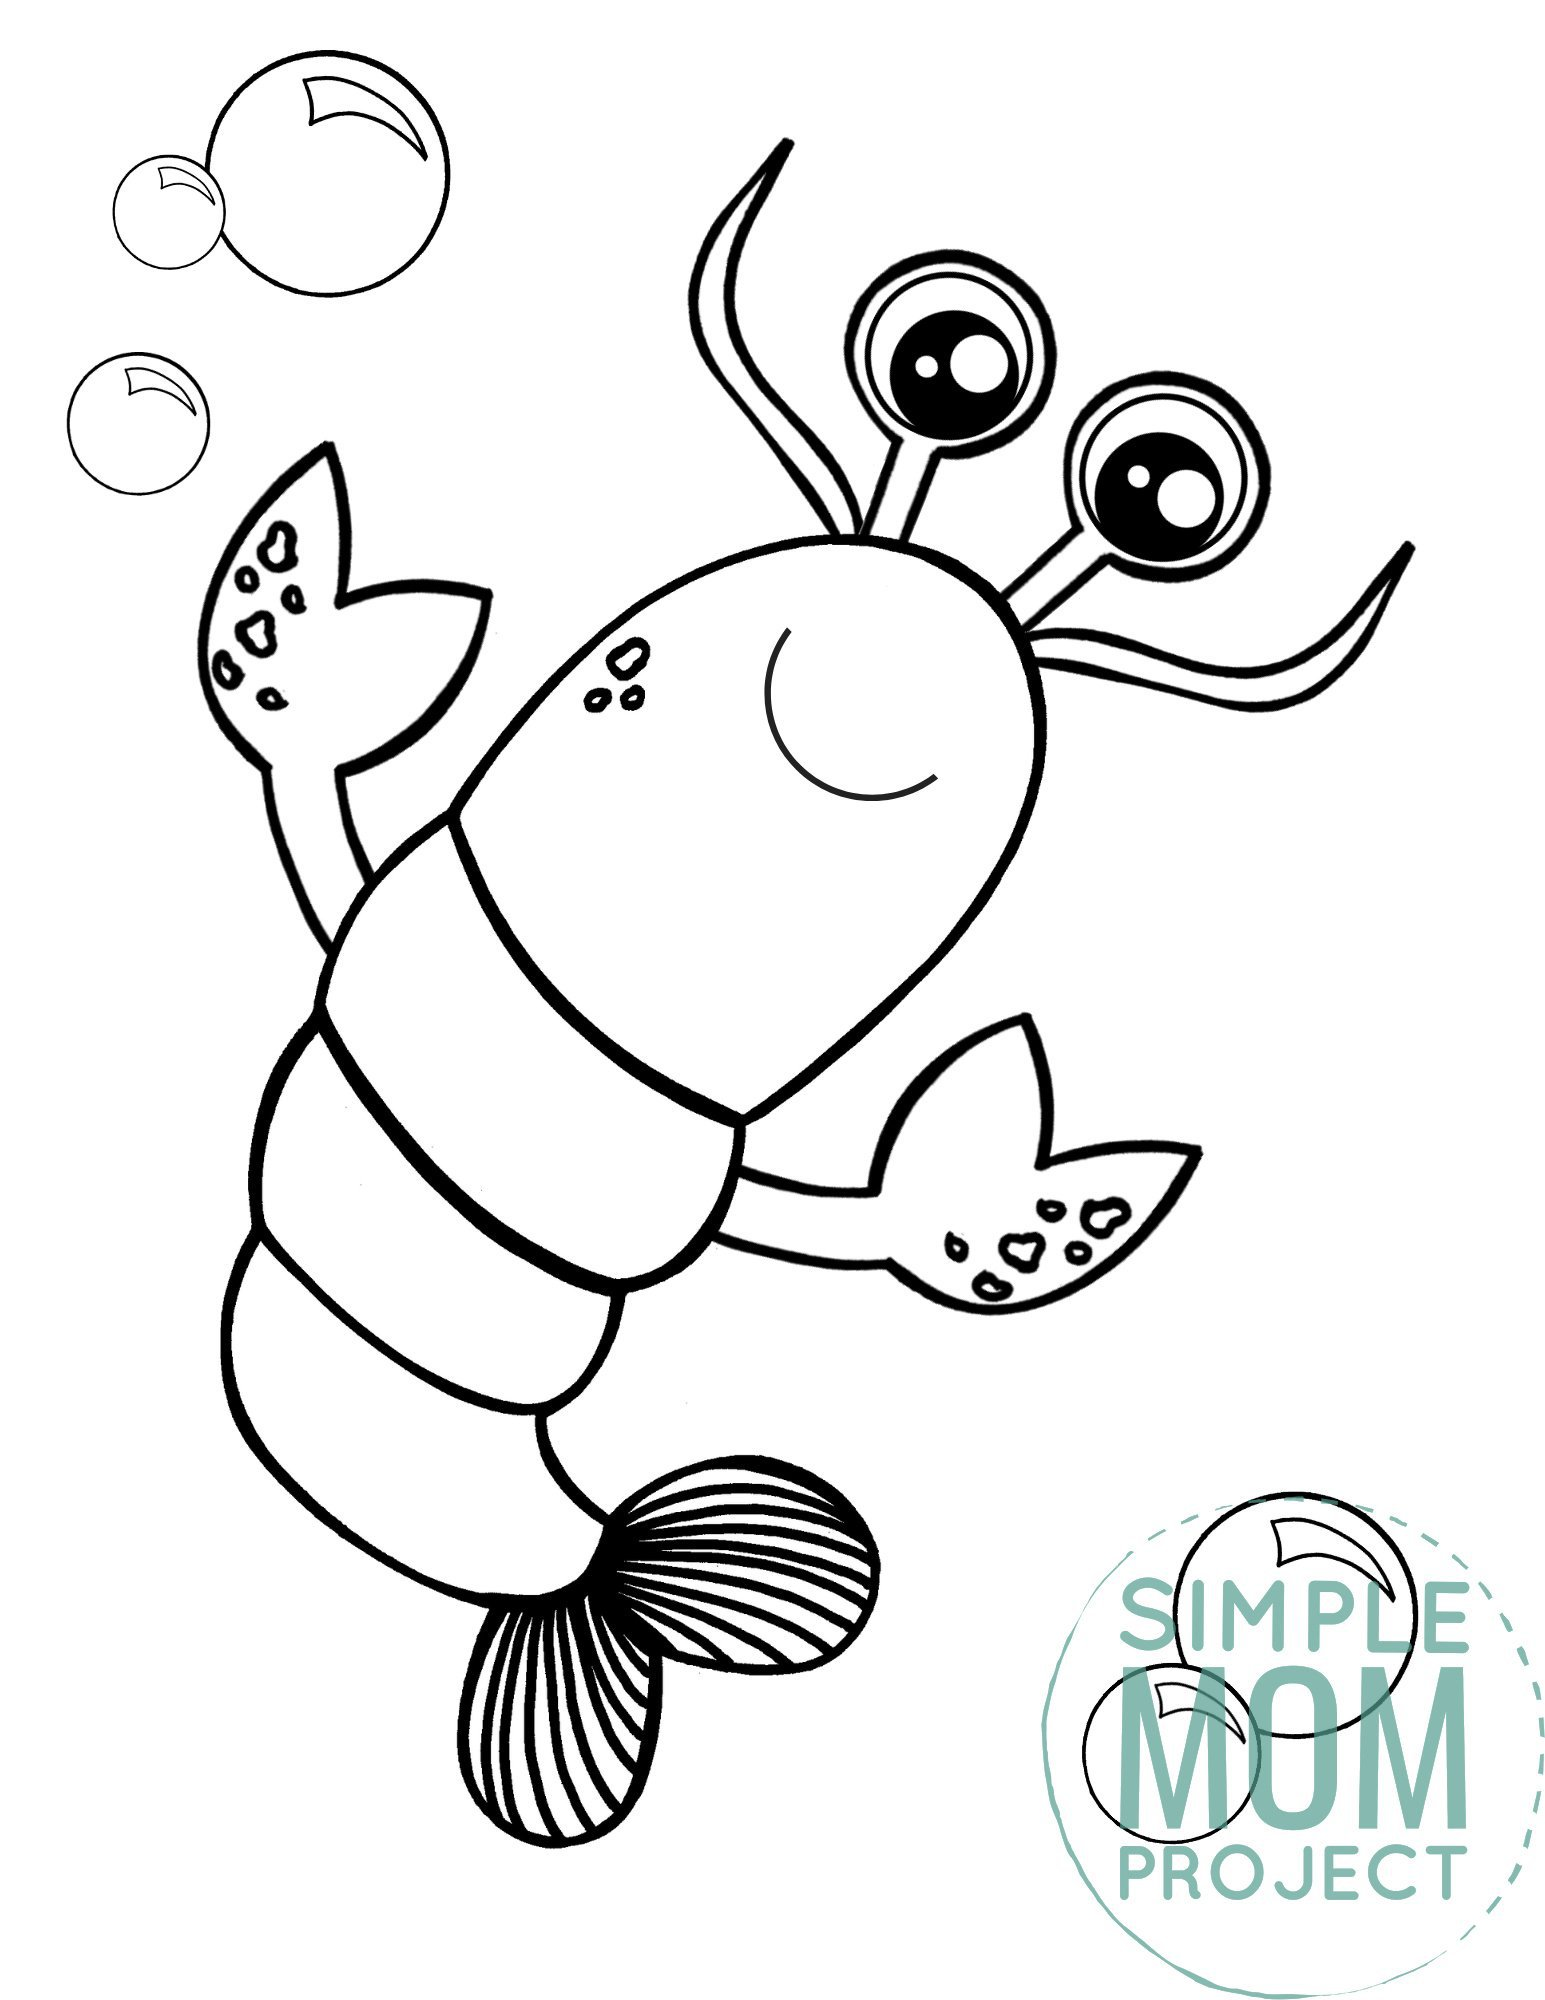 Printable Lobster Ocean Animal Coloring Page for Kids